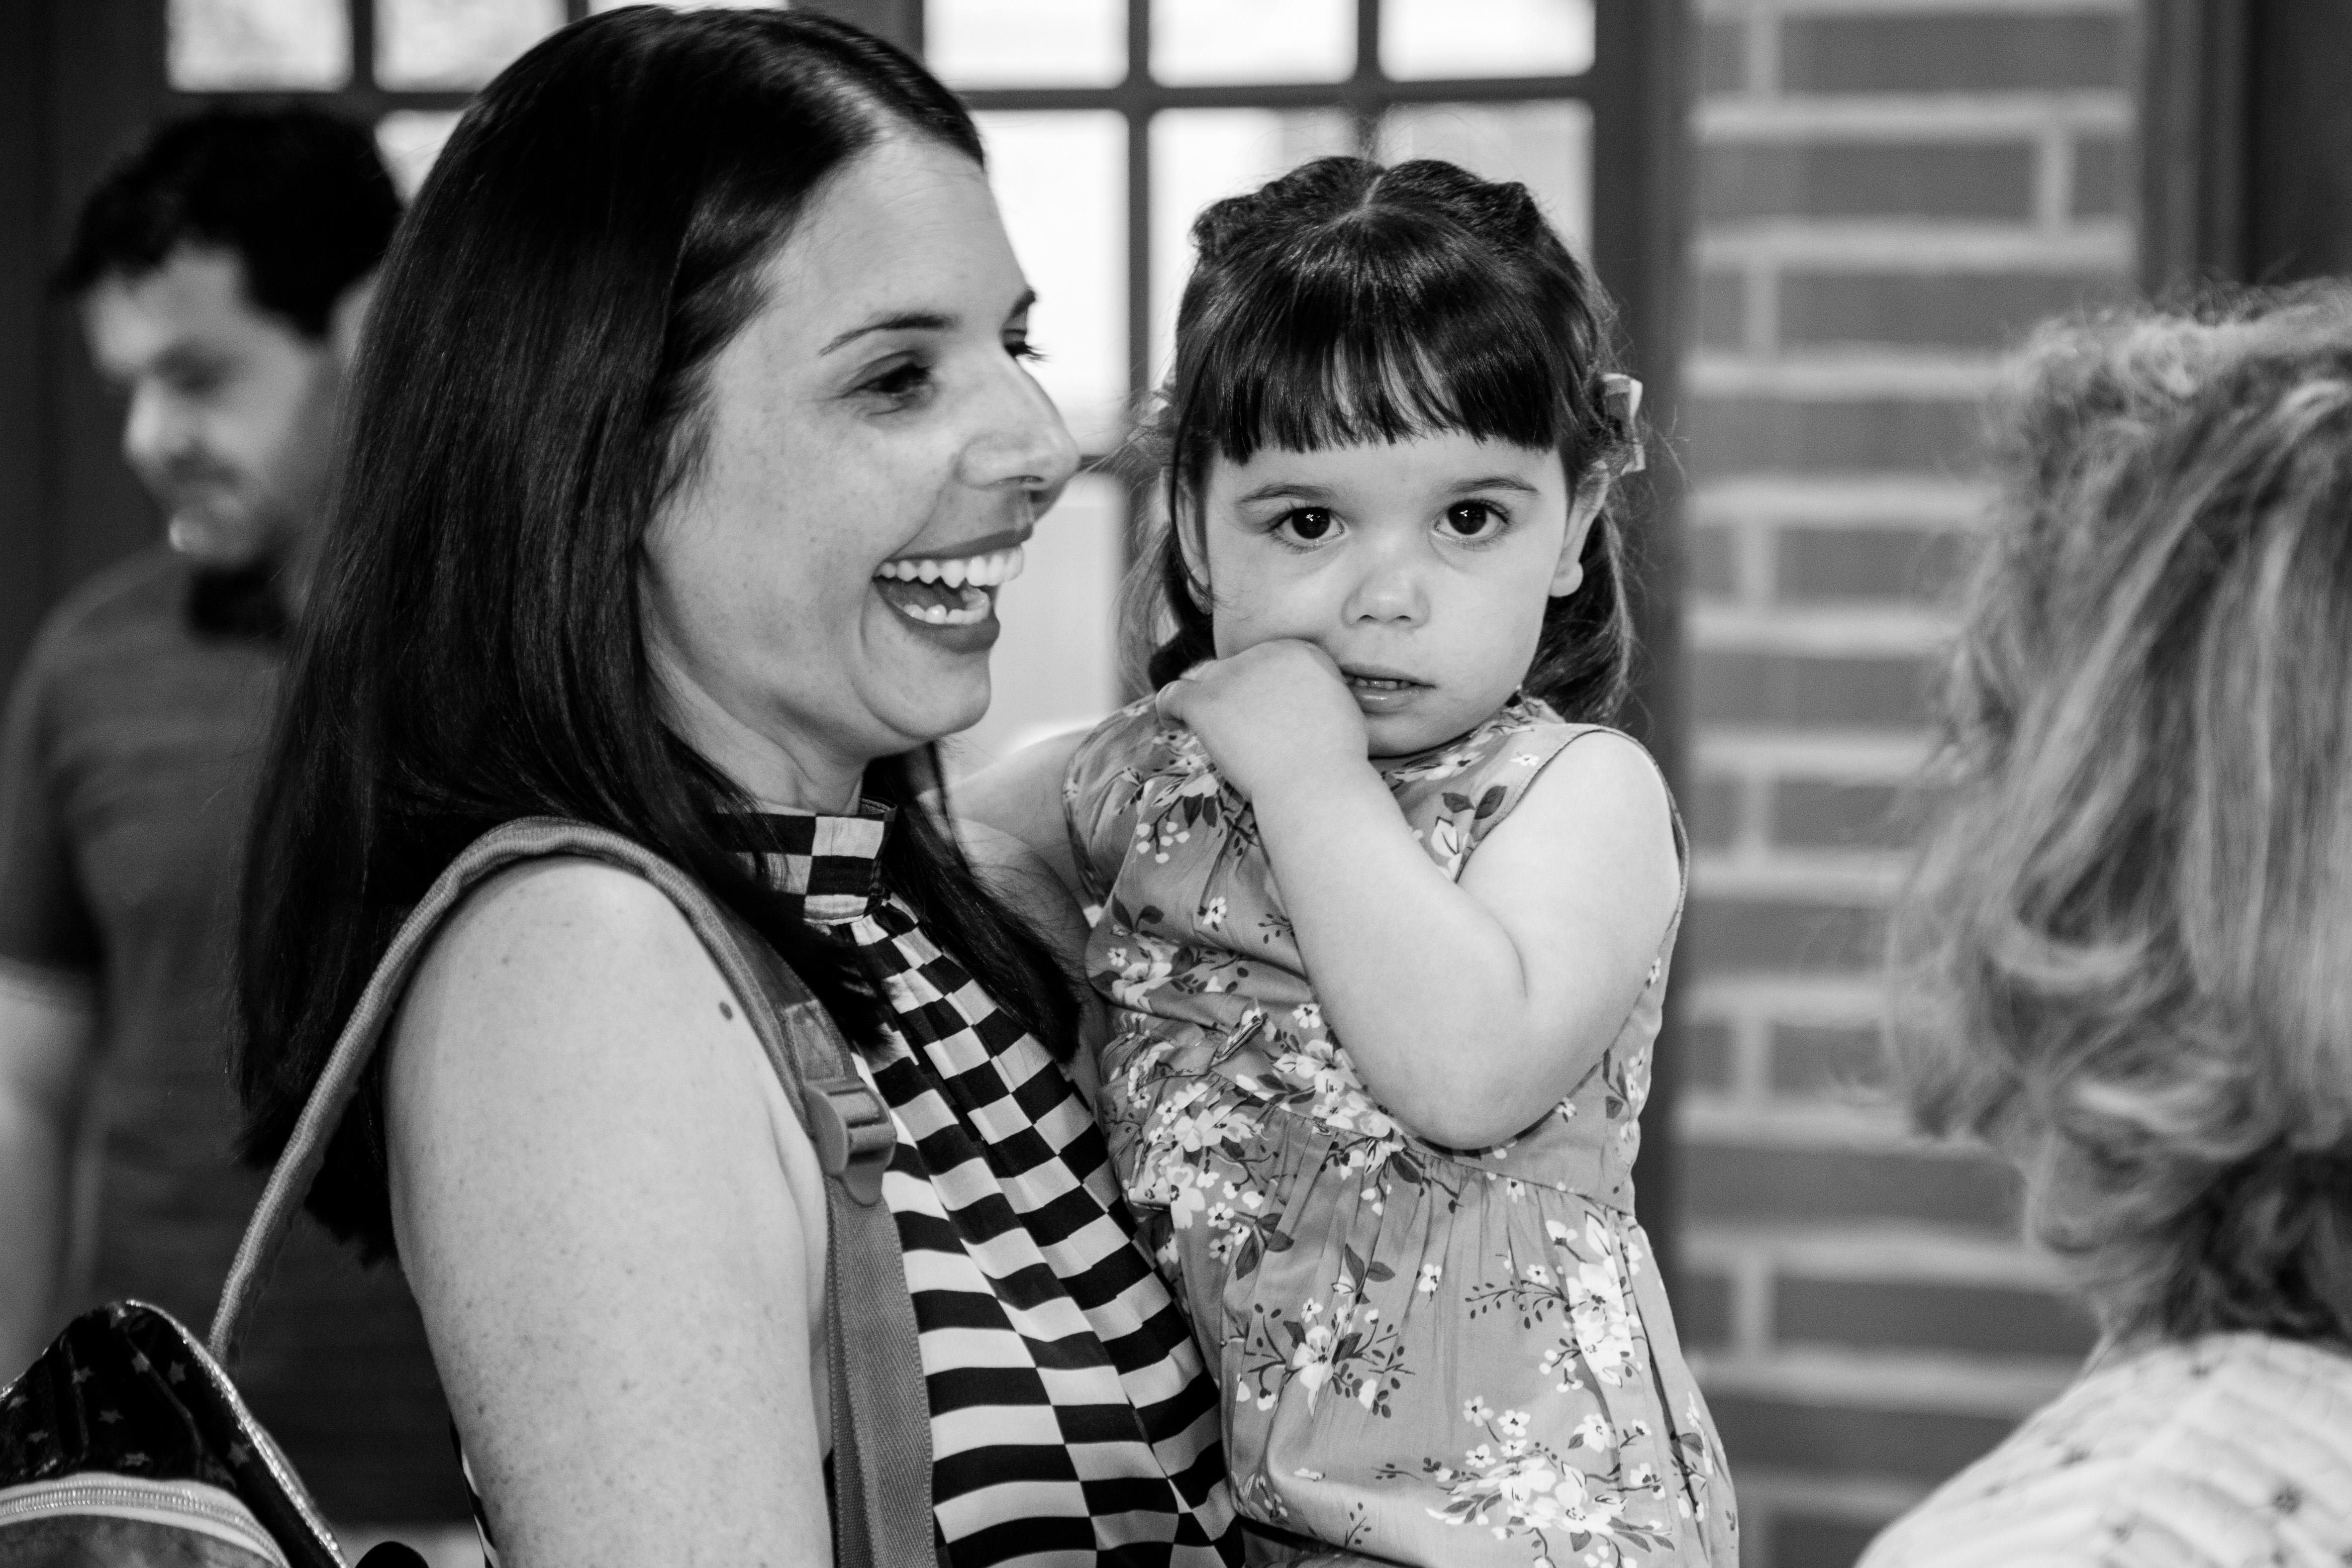 Festa‐Infantil‐Florianopolis‐Ana‐Marmo‐FotografiaFesta‐Infantil‐Florianopolis‐Ana‐Marmo‐Fotografia191A0513